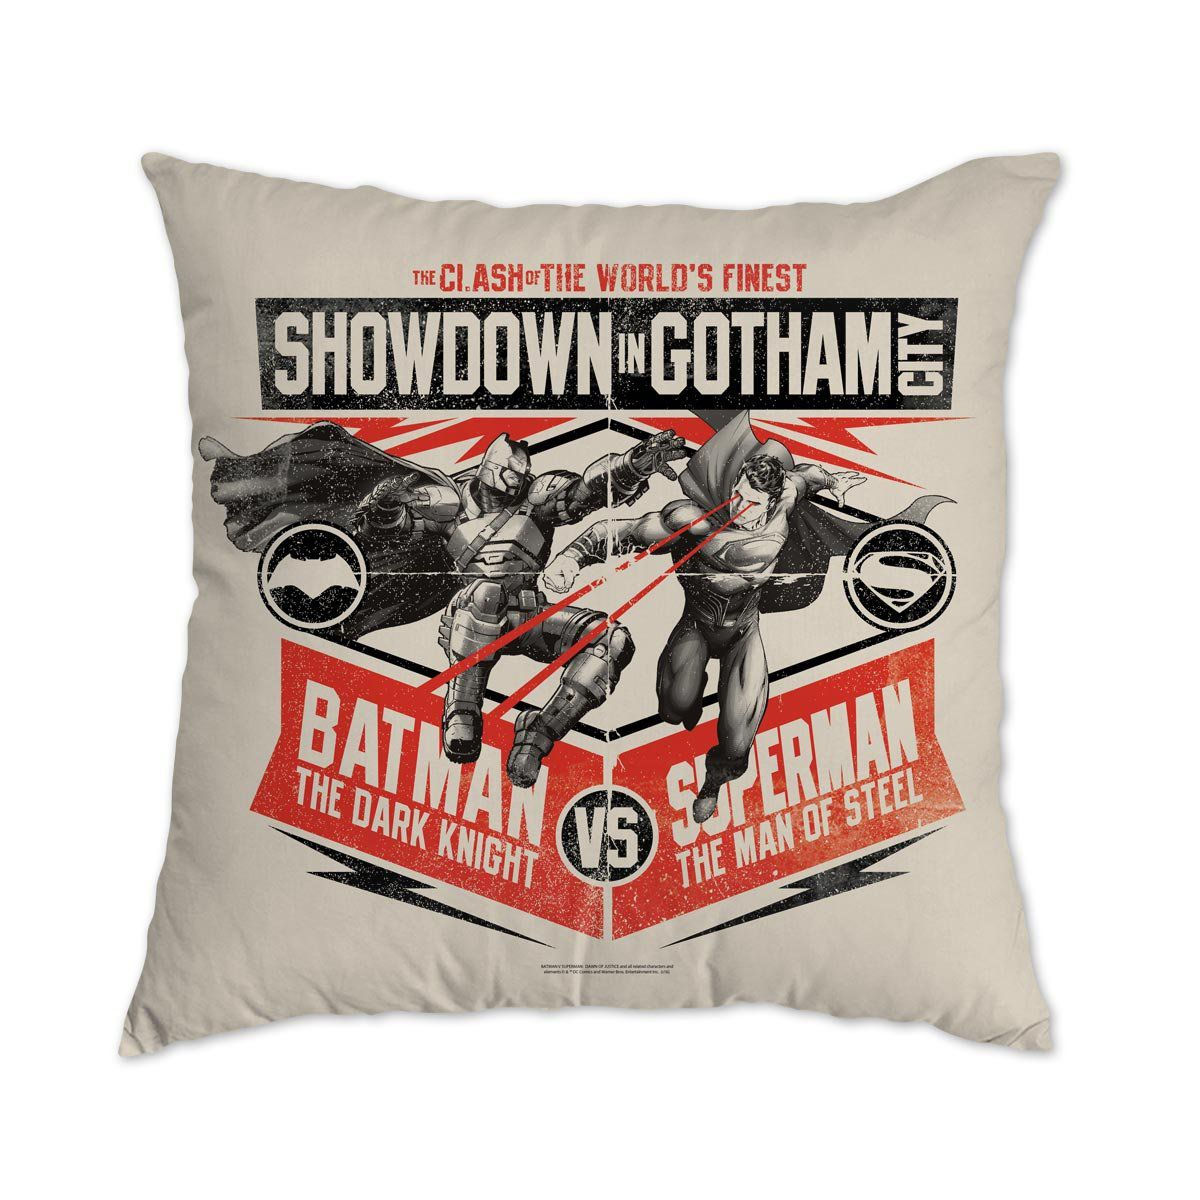 Almofada Batman VS Superman Showdown In Gotham City  - bandUP Store Marketplace